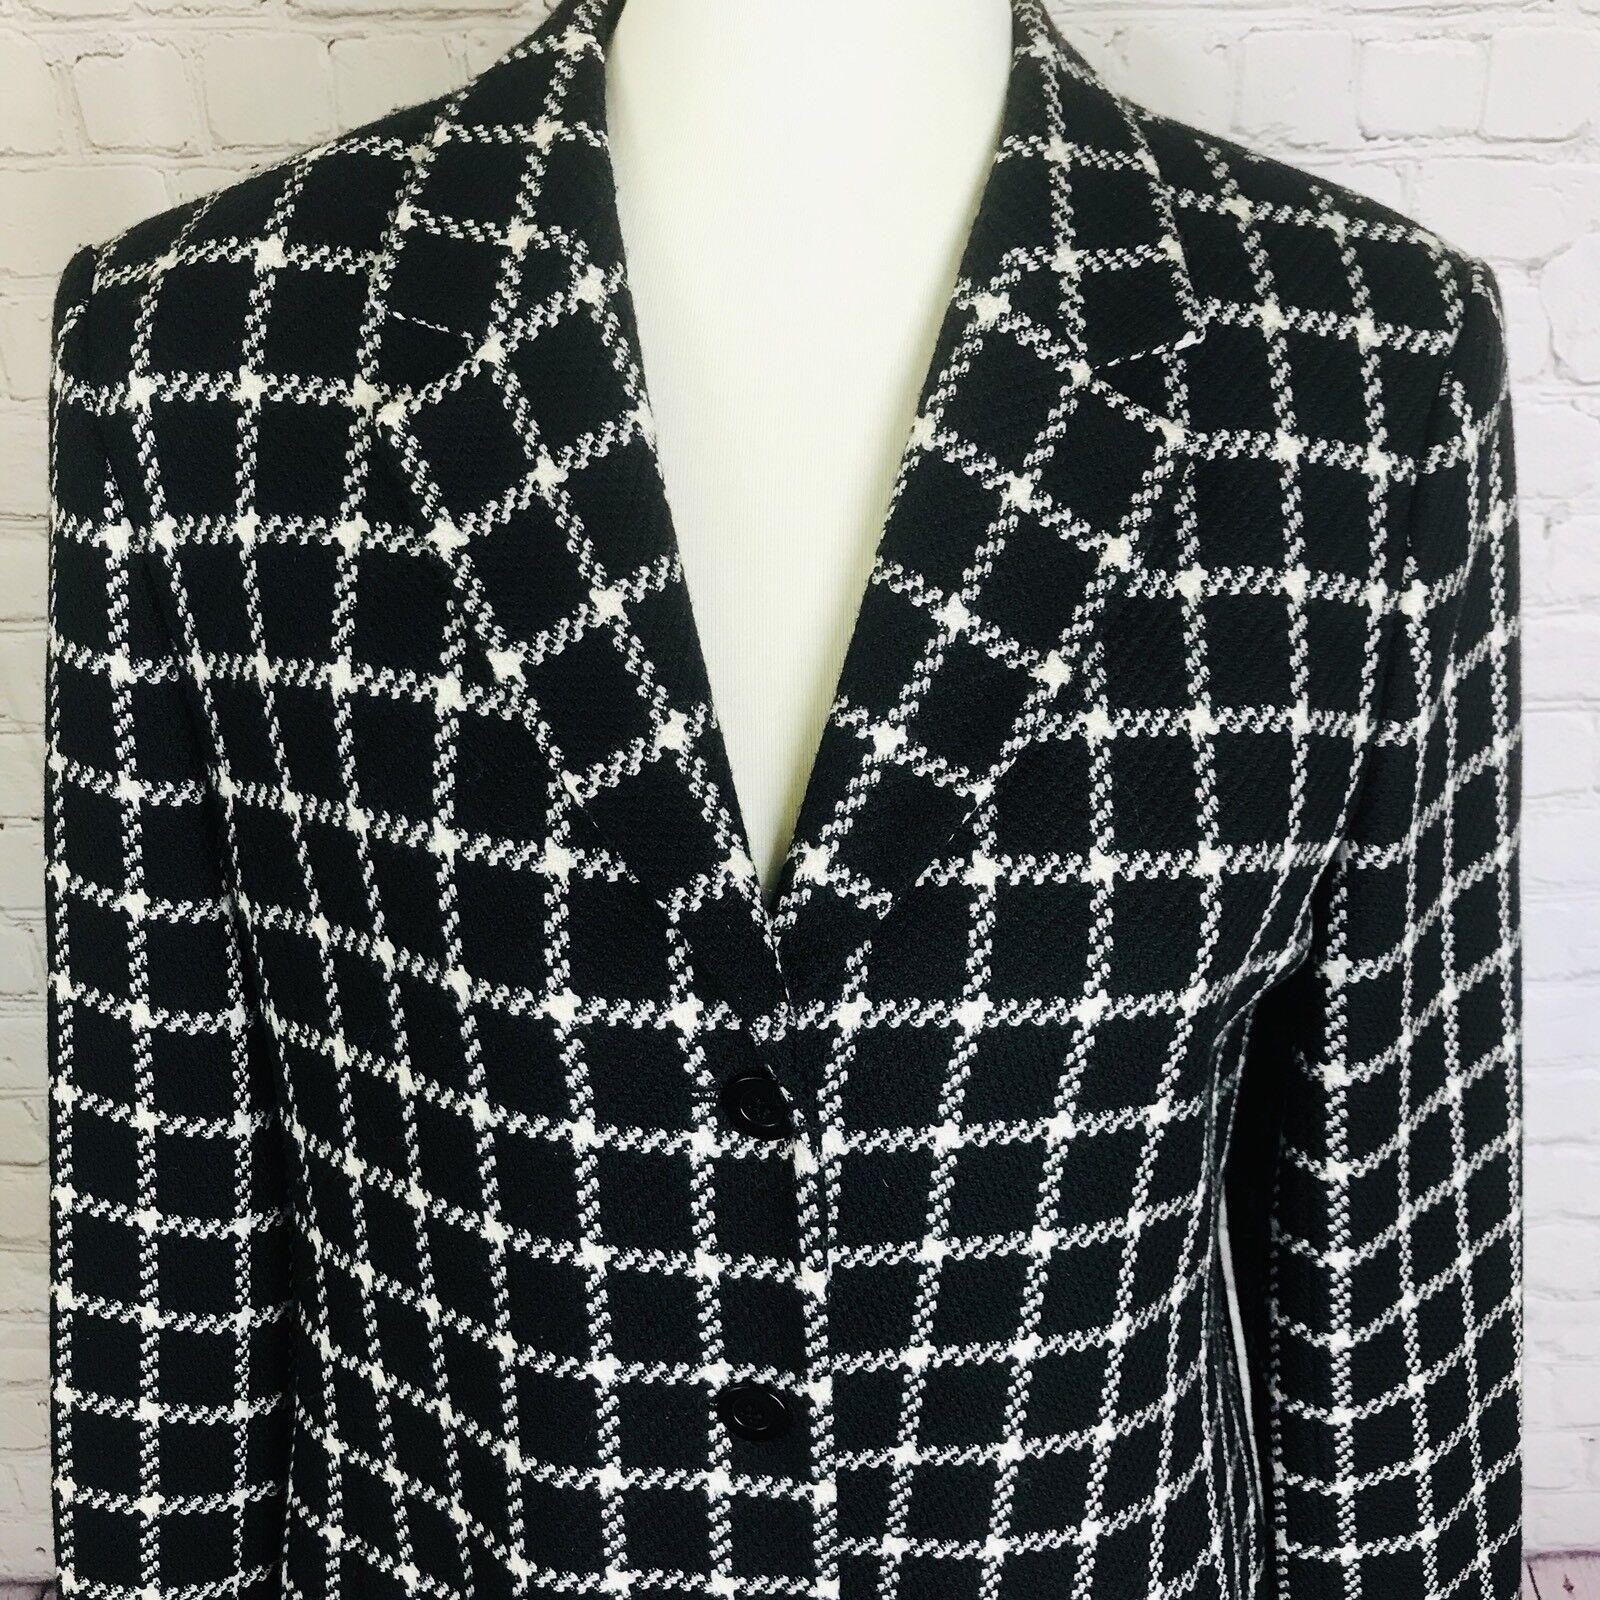 Talbots Women Wool Pea Coat Lined 3-button Black Ivory Windowpane Plaid Sz 8 L12